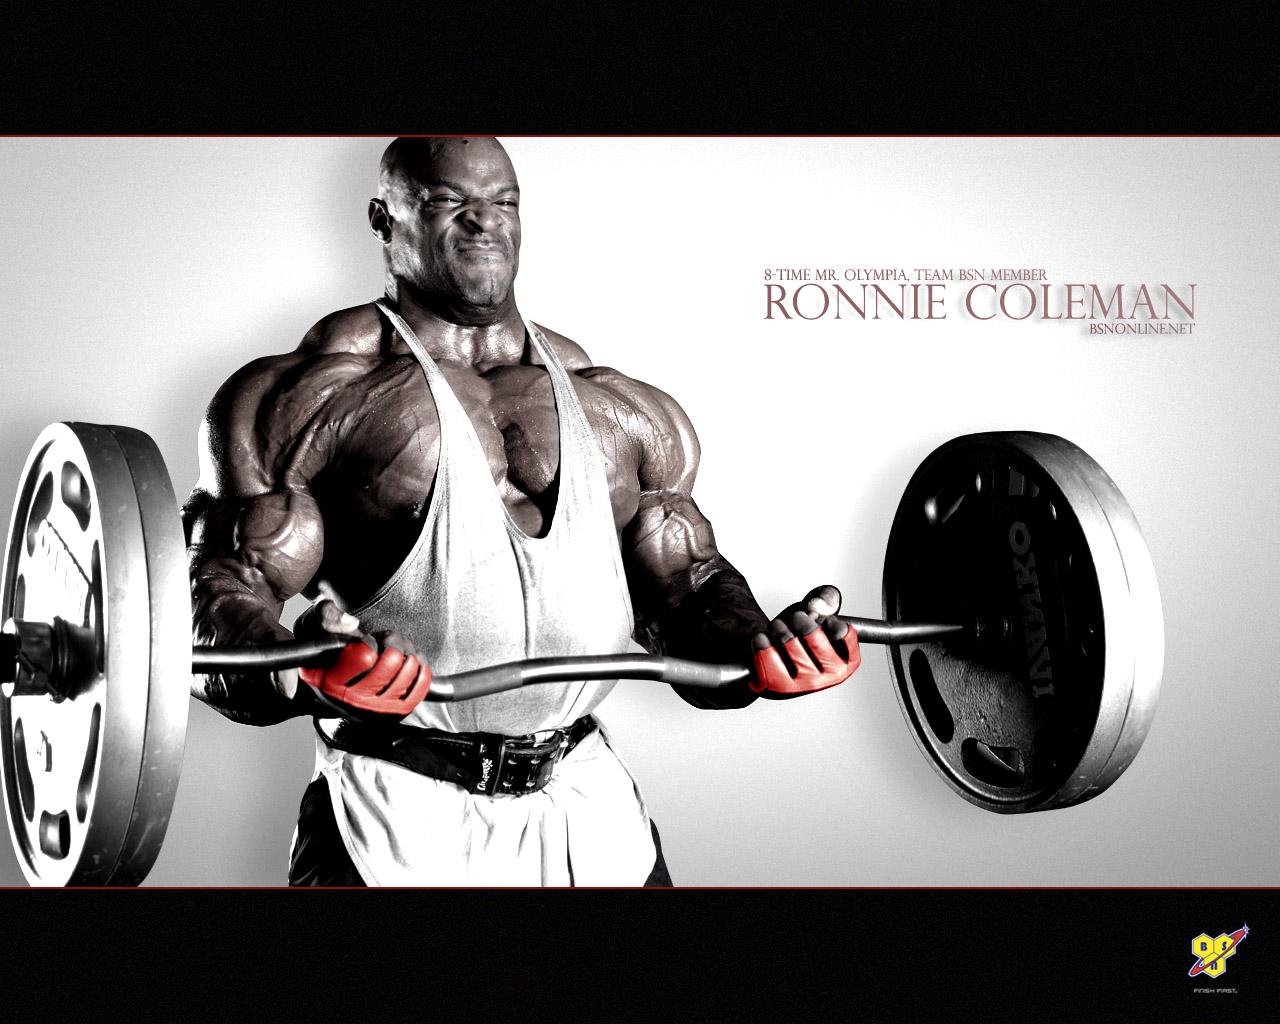 http://3.bp.blogspot.com/-DNgDraPW2h8/Tx9_dRNLn1I/AAAAAAAABPM/_njNFdZXaIg/s1600/Ronnie+Coleman.jpg